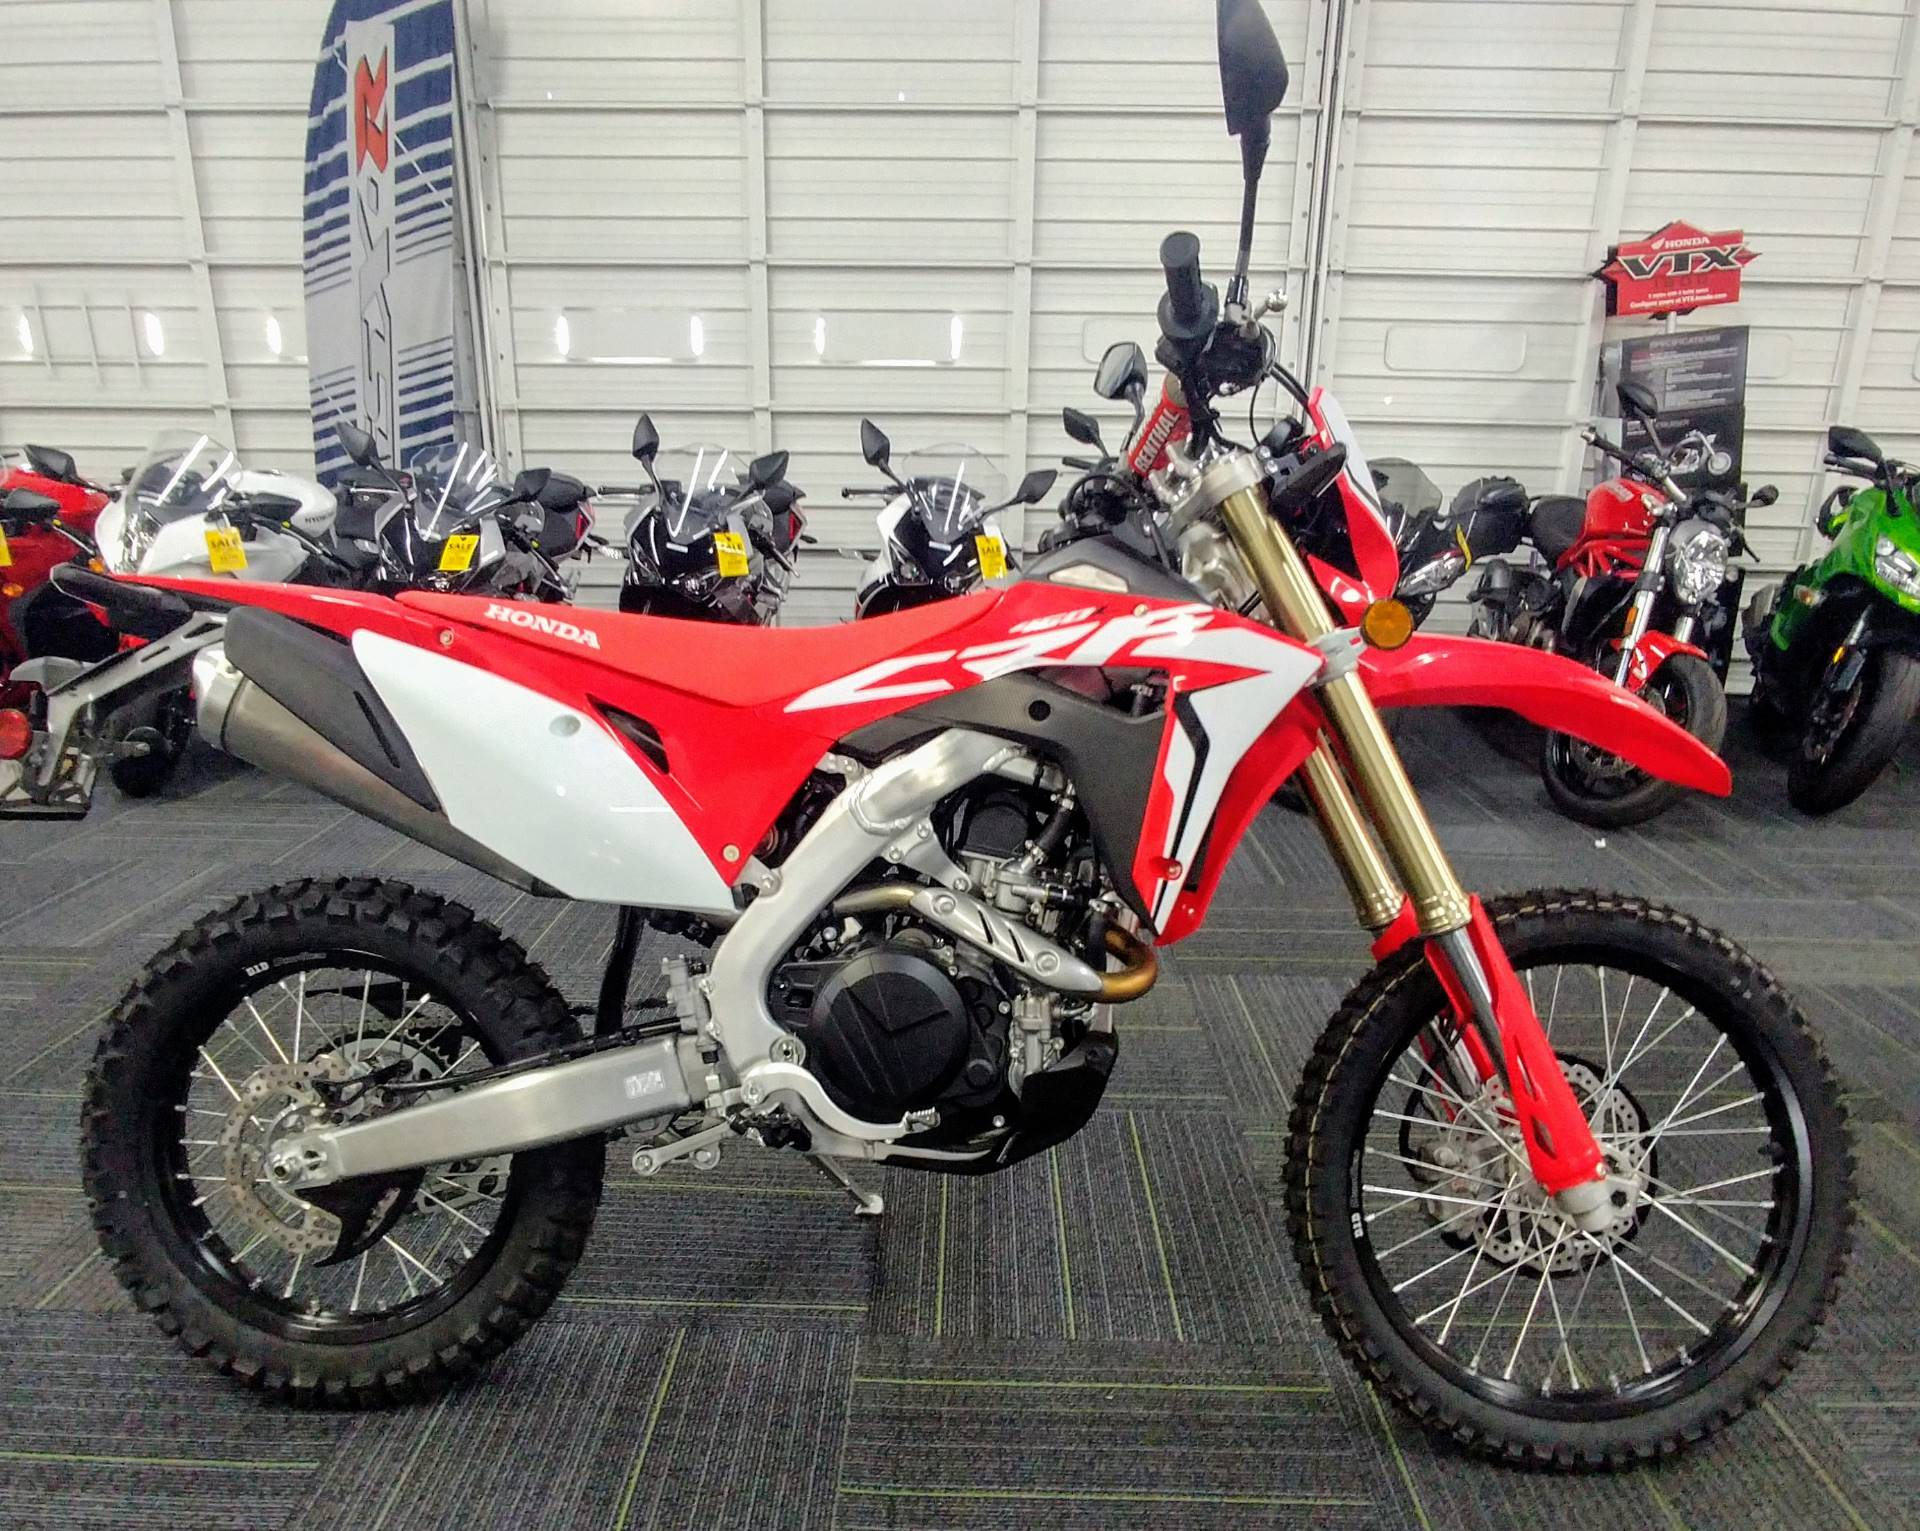 New 2019 Honda Crf450l Motorcycles In Ontario Ca Ho18233 Red